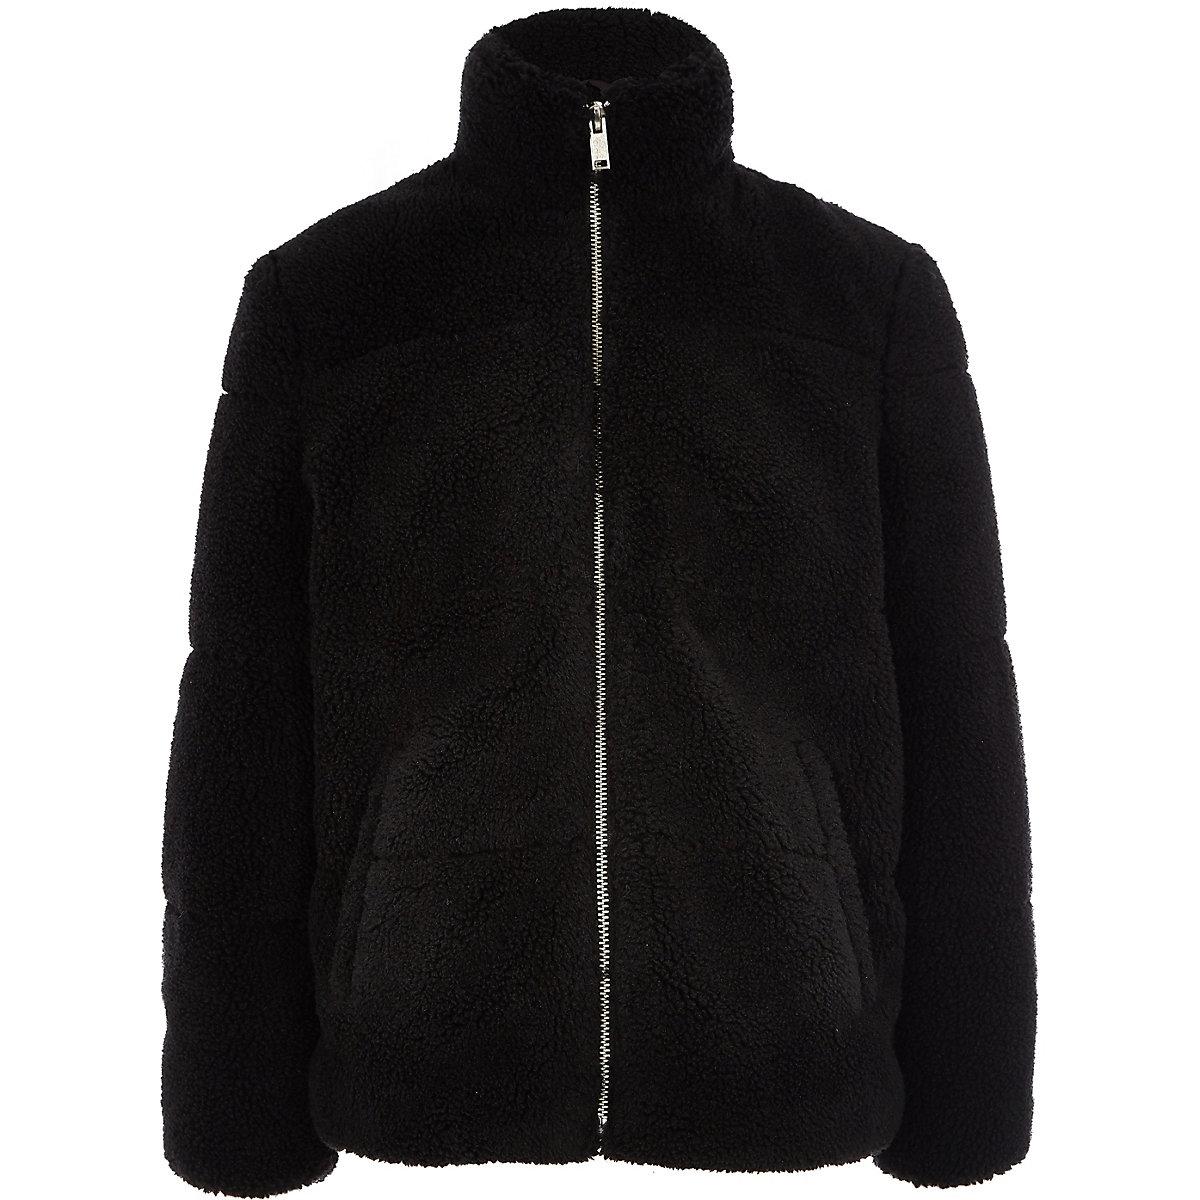 Boys black fleece puffer jacket